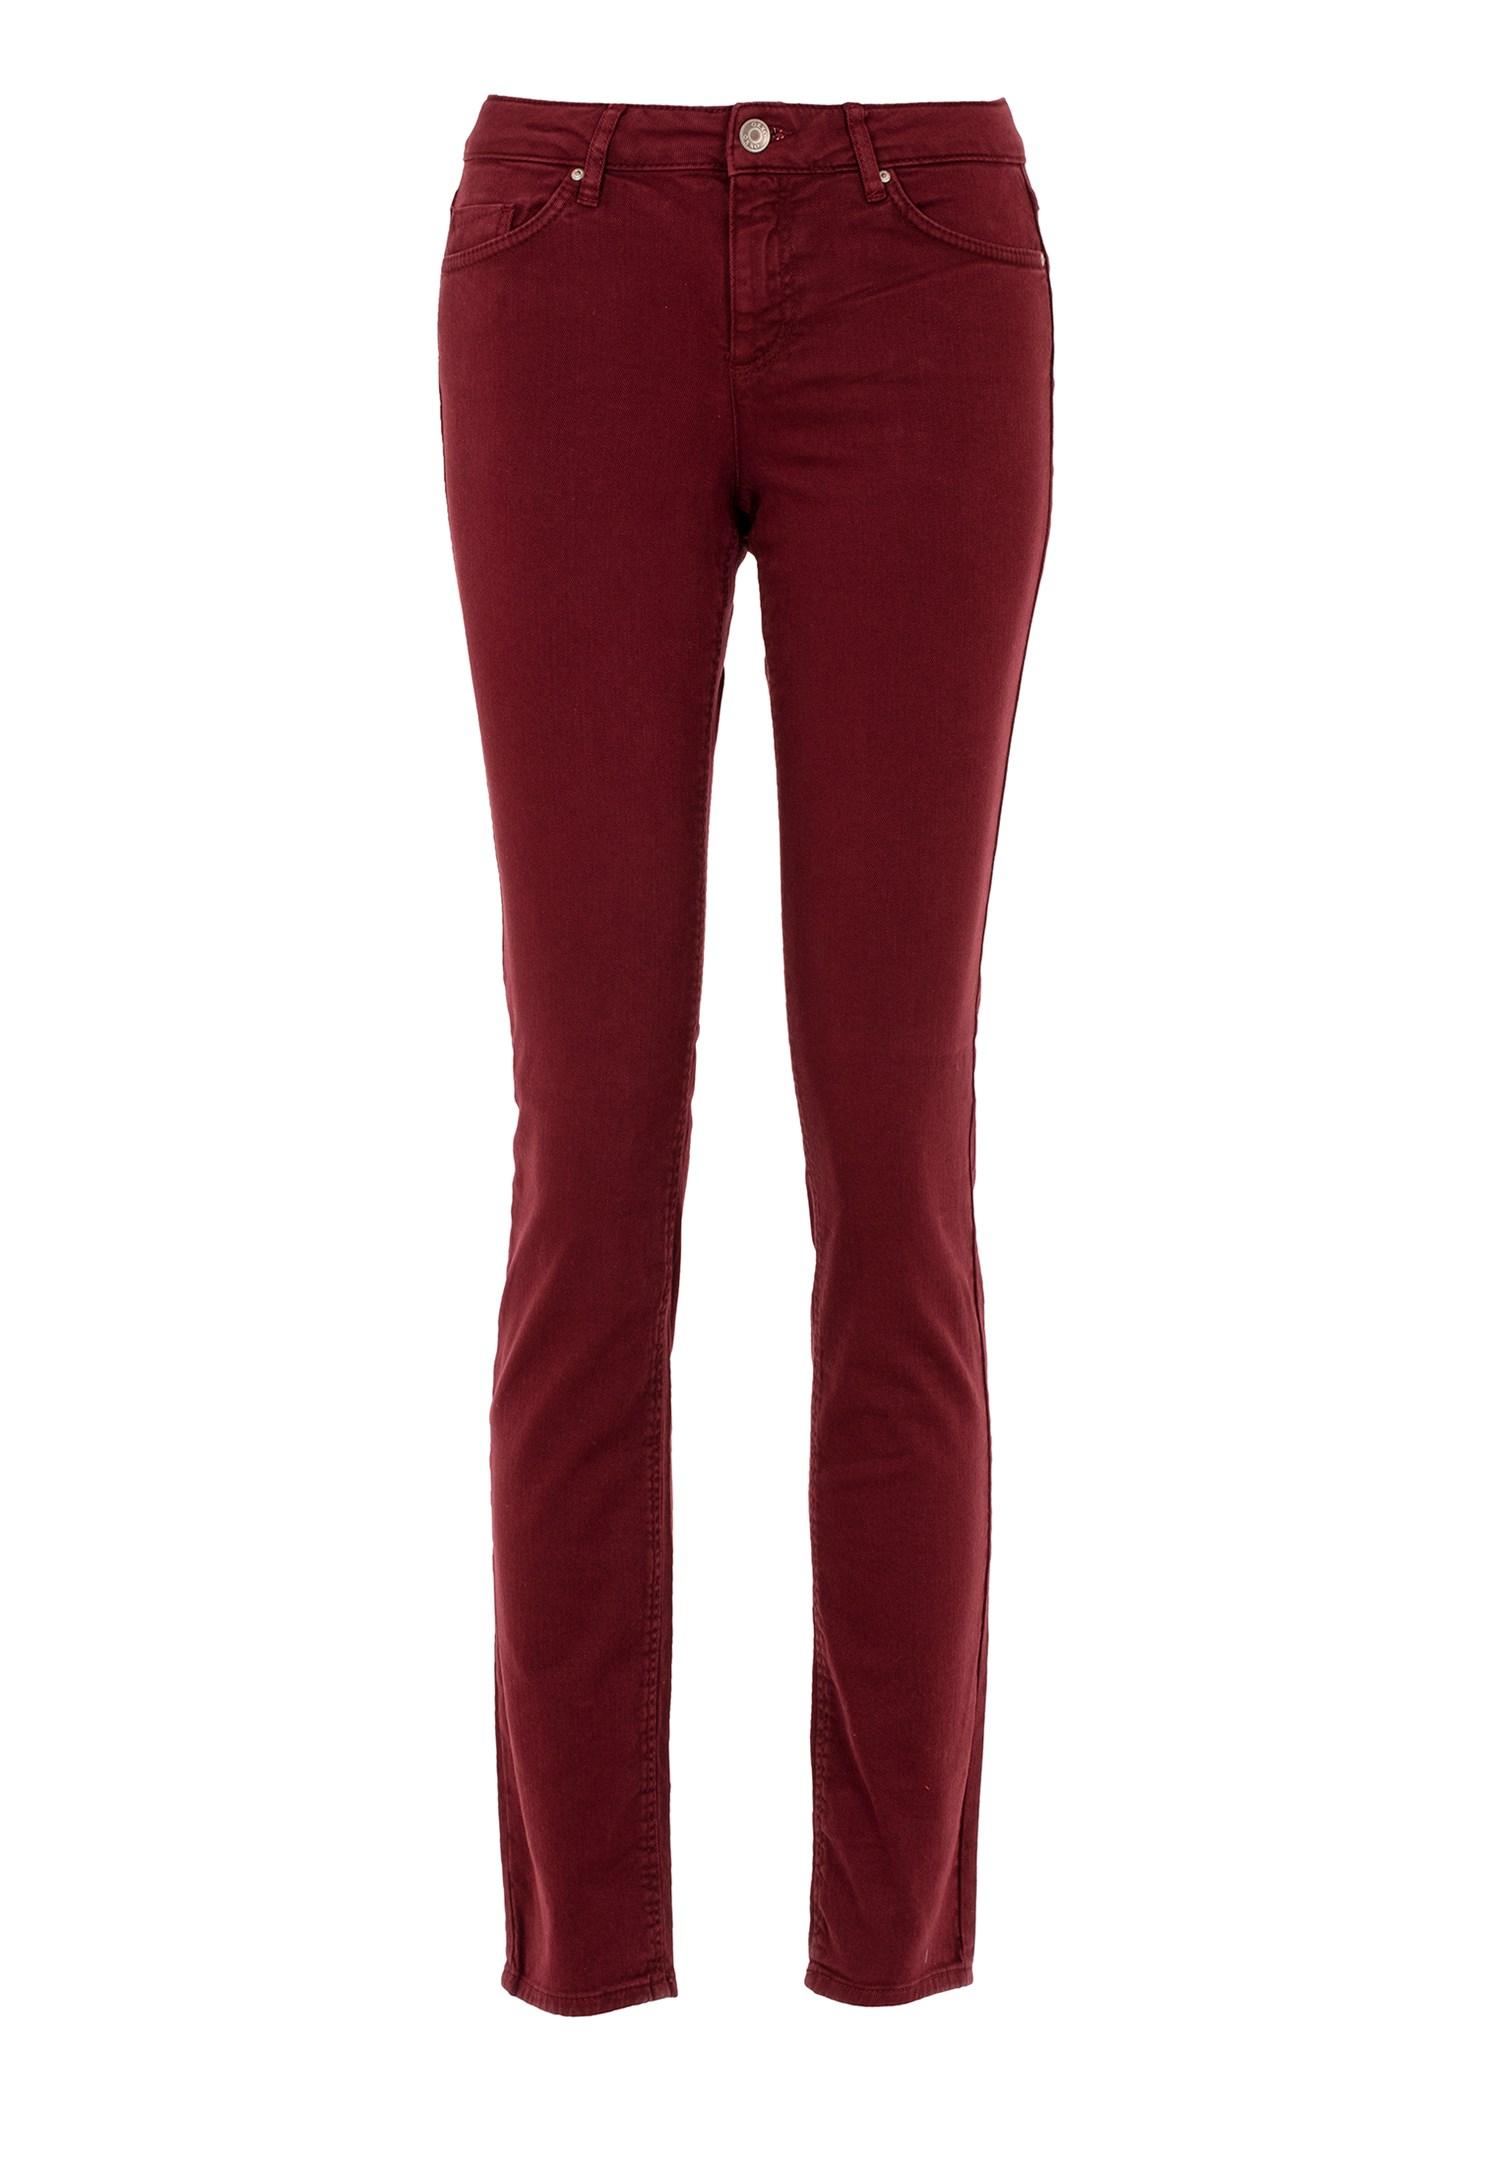 Bayan Kırmızı Düşük Bel Slim Paça Pantolon